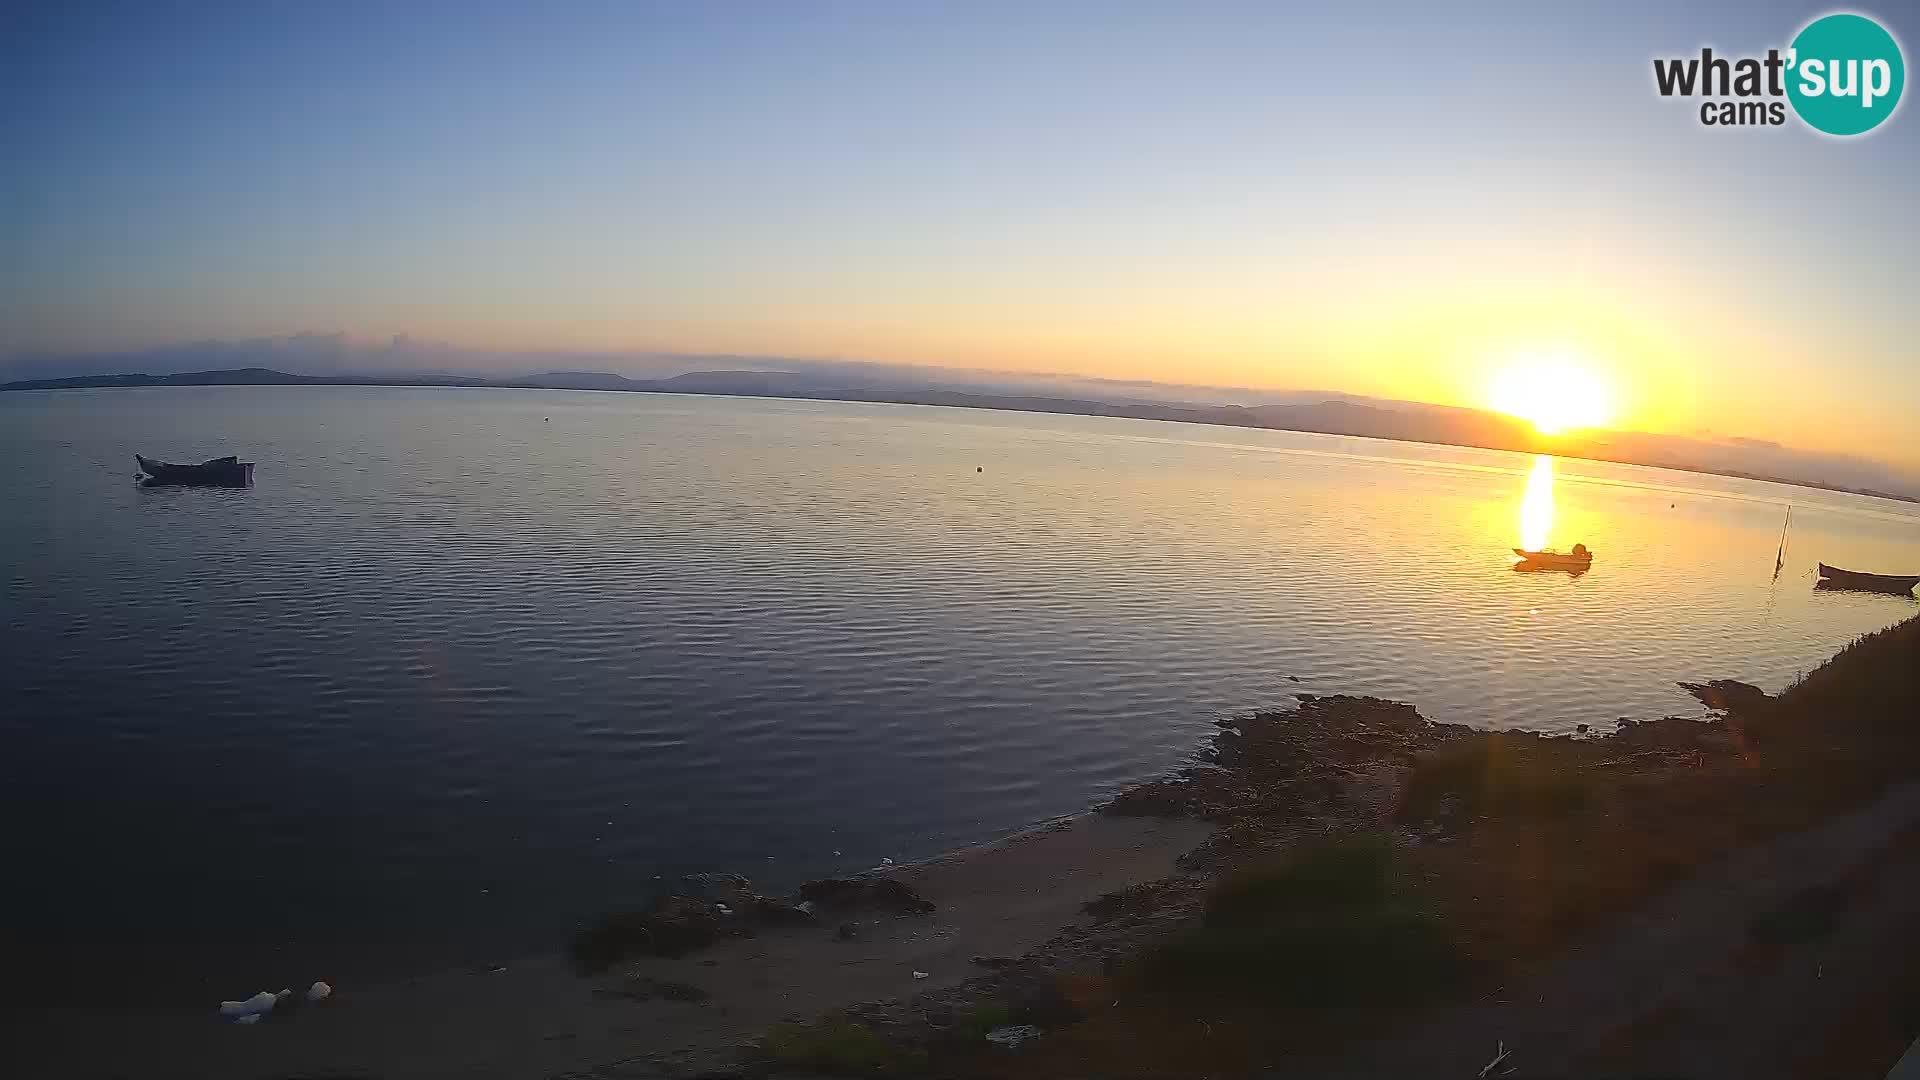 Windsurfing Club Sa Barra camera en vivo Sant'Antioco – Cerdeña – Italia